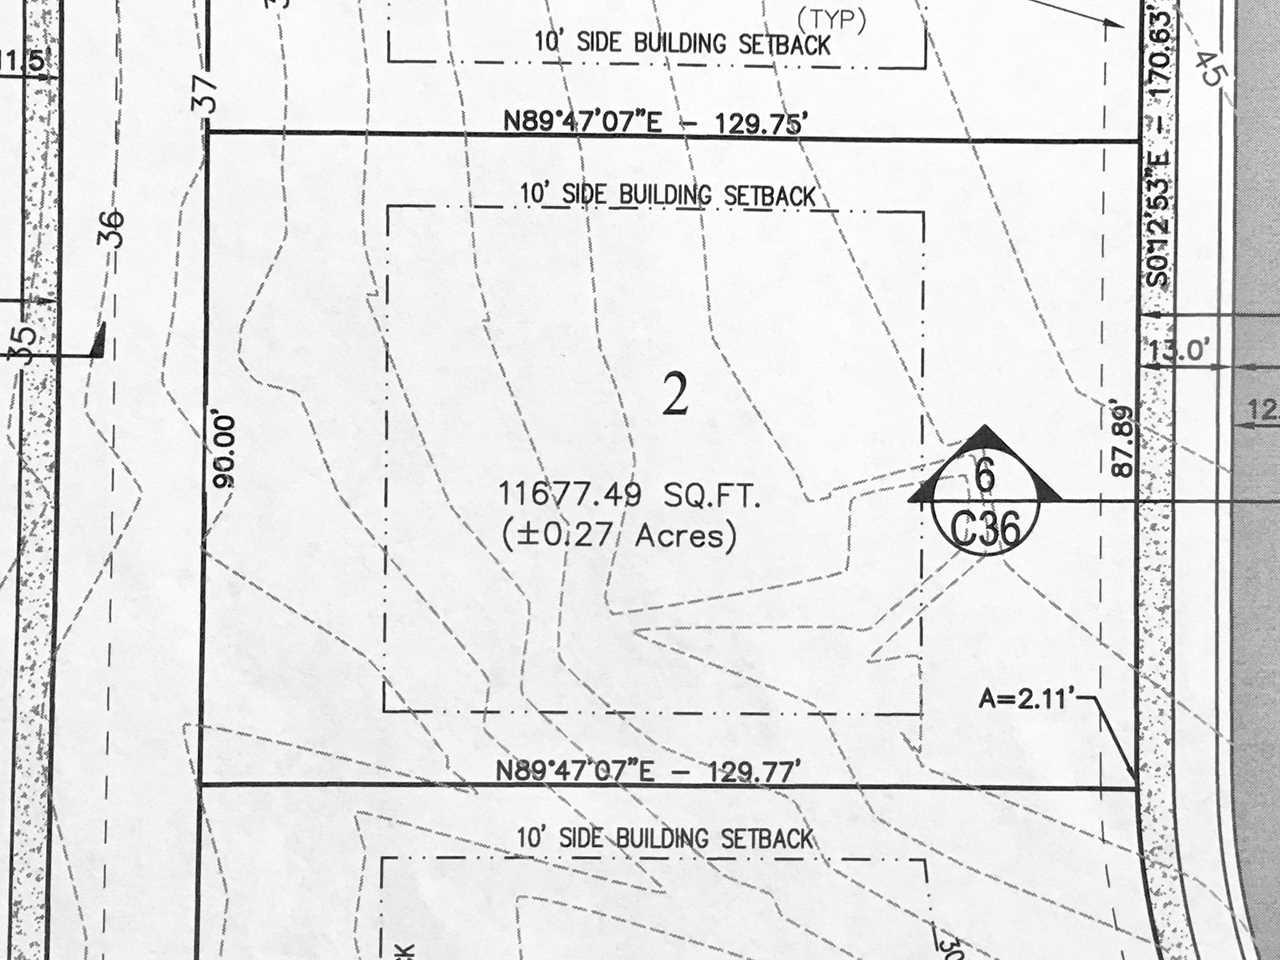 Niceville Florida Map.1204 Elderflower Dr Niceville Fl 32578 Mls 781122